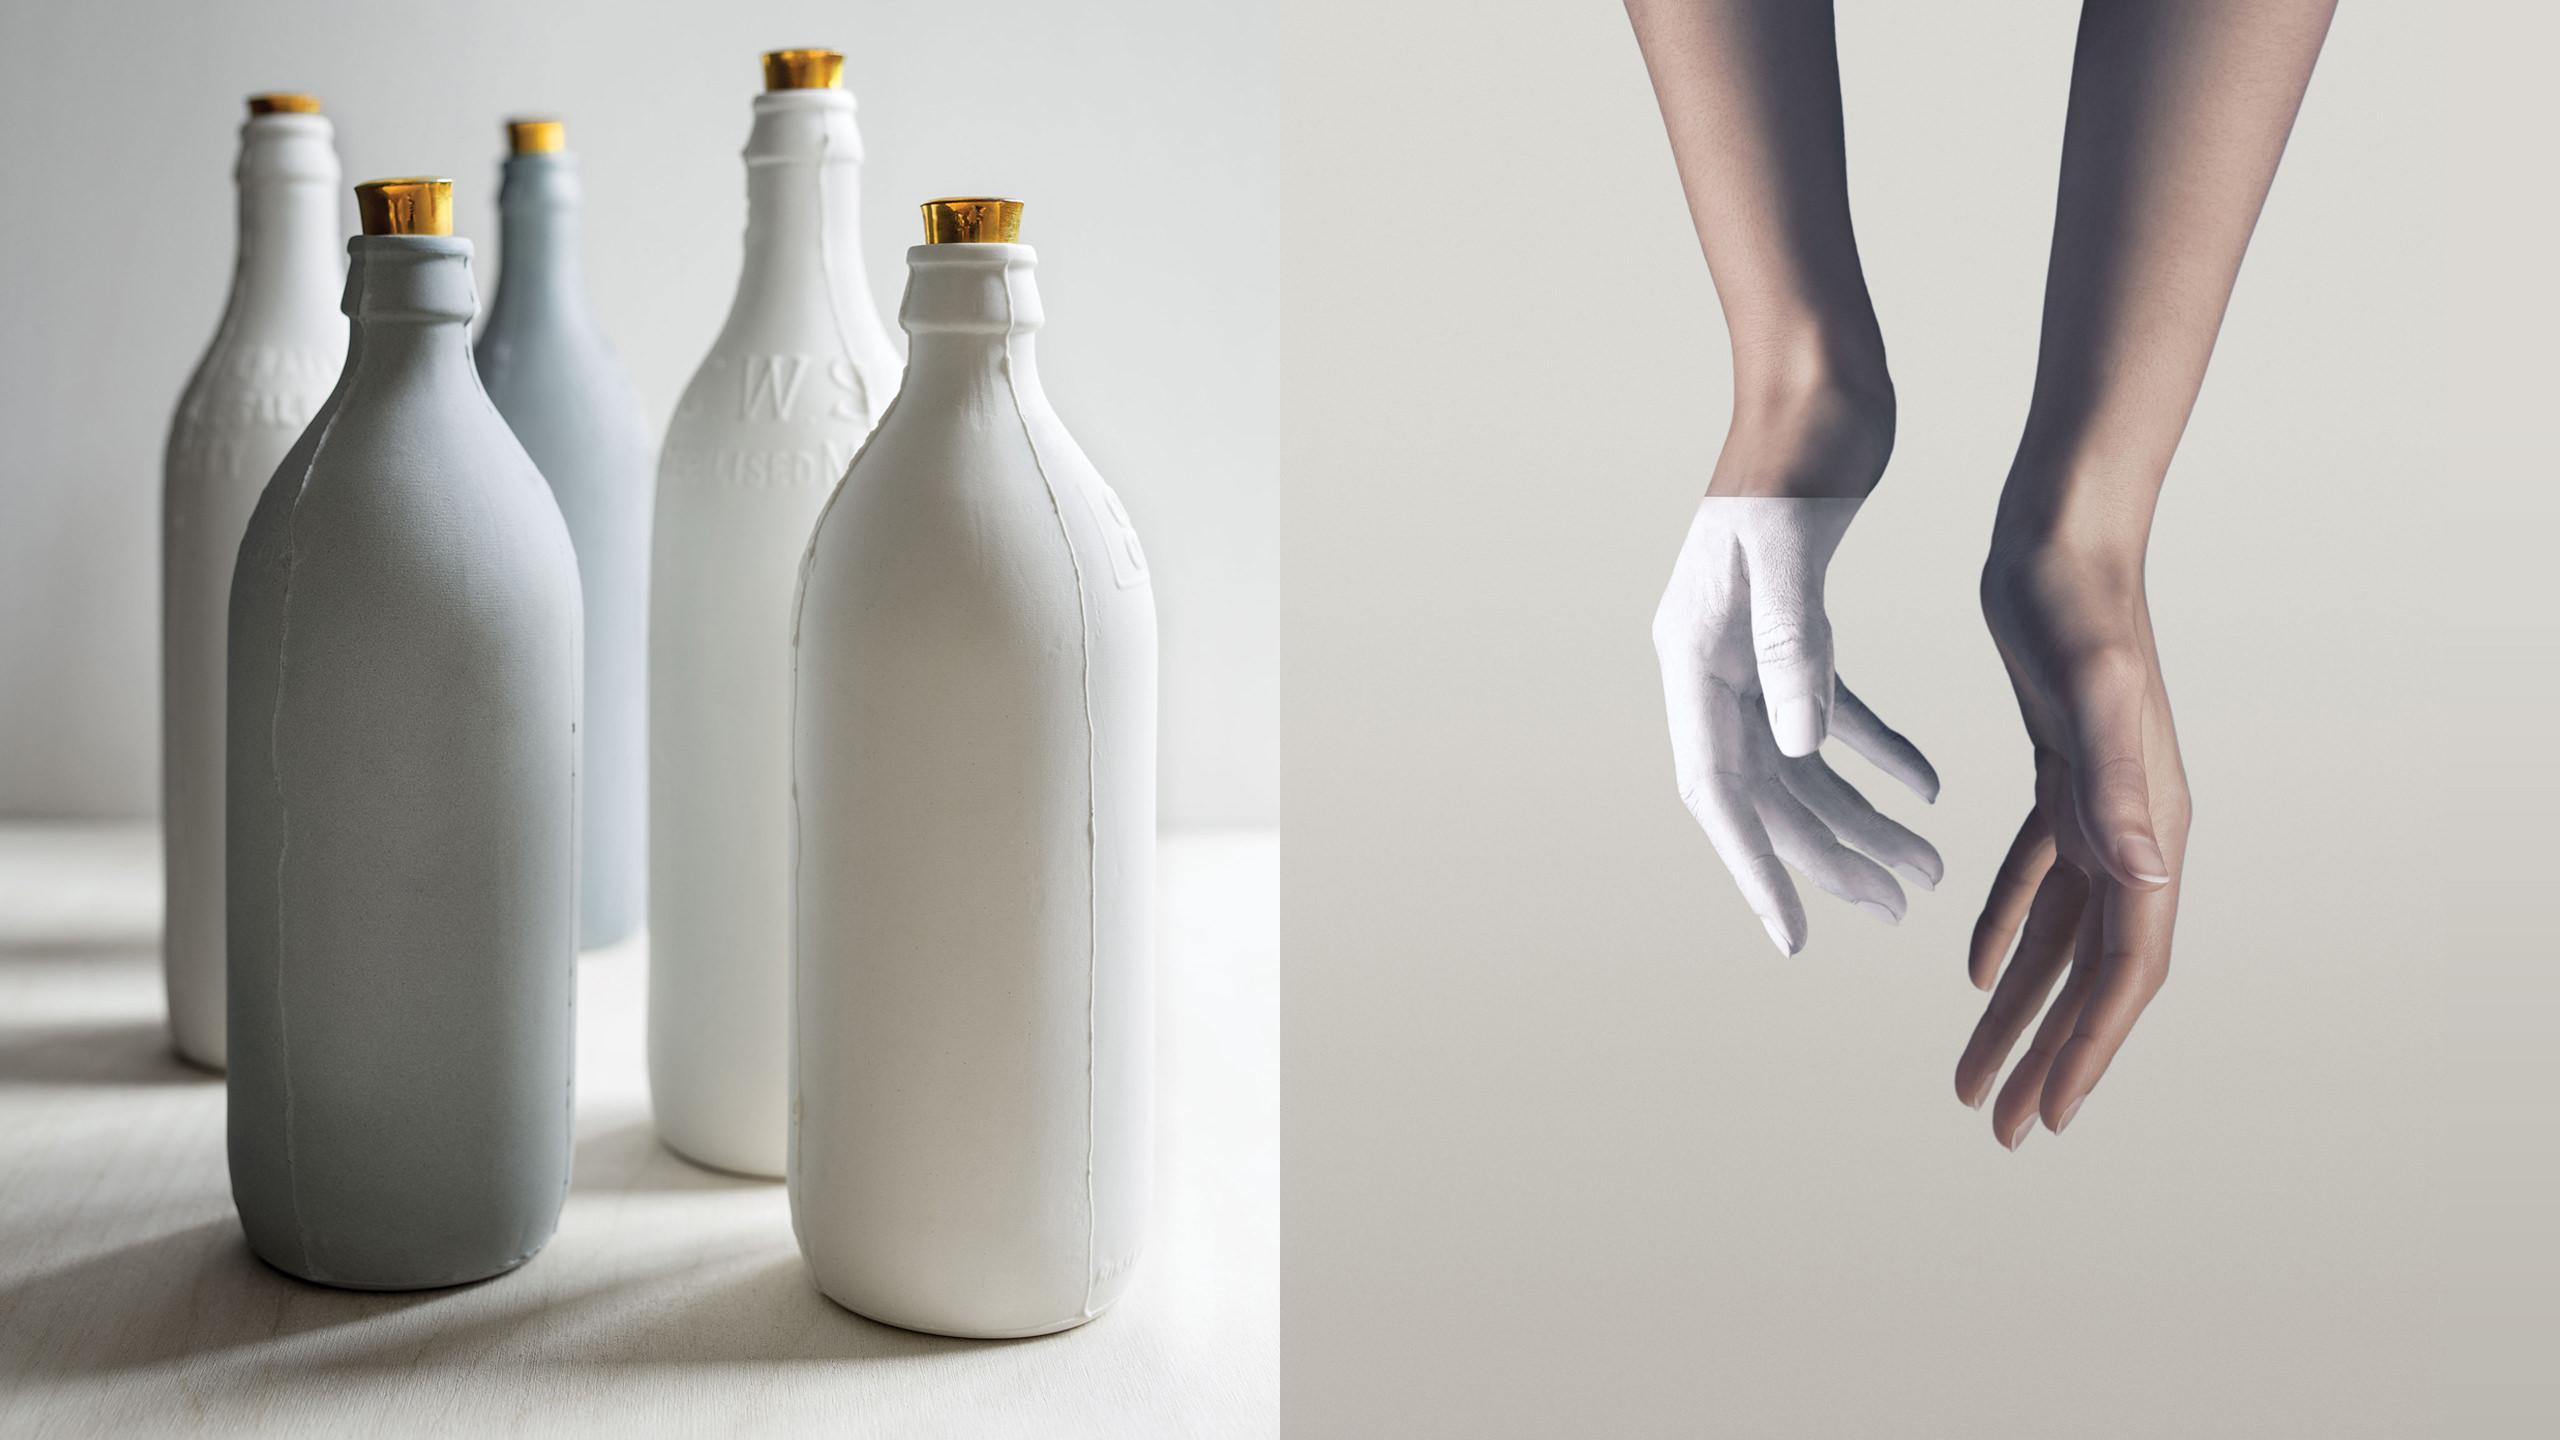 gmund-photography-label-white-hand-12